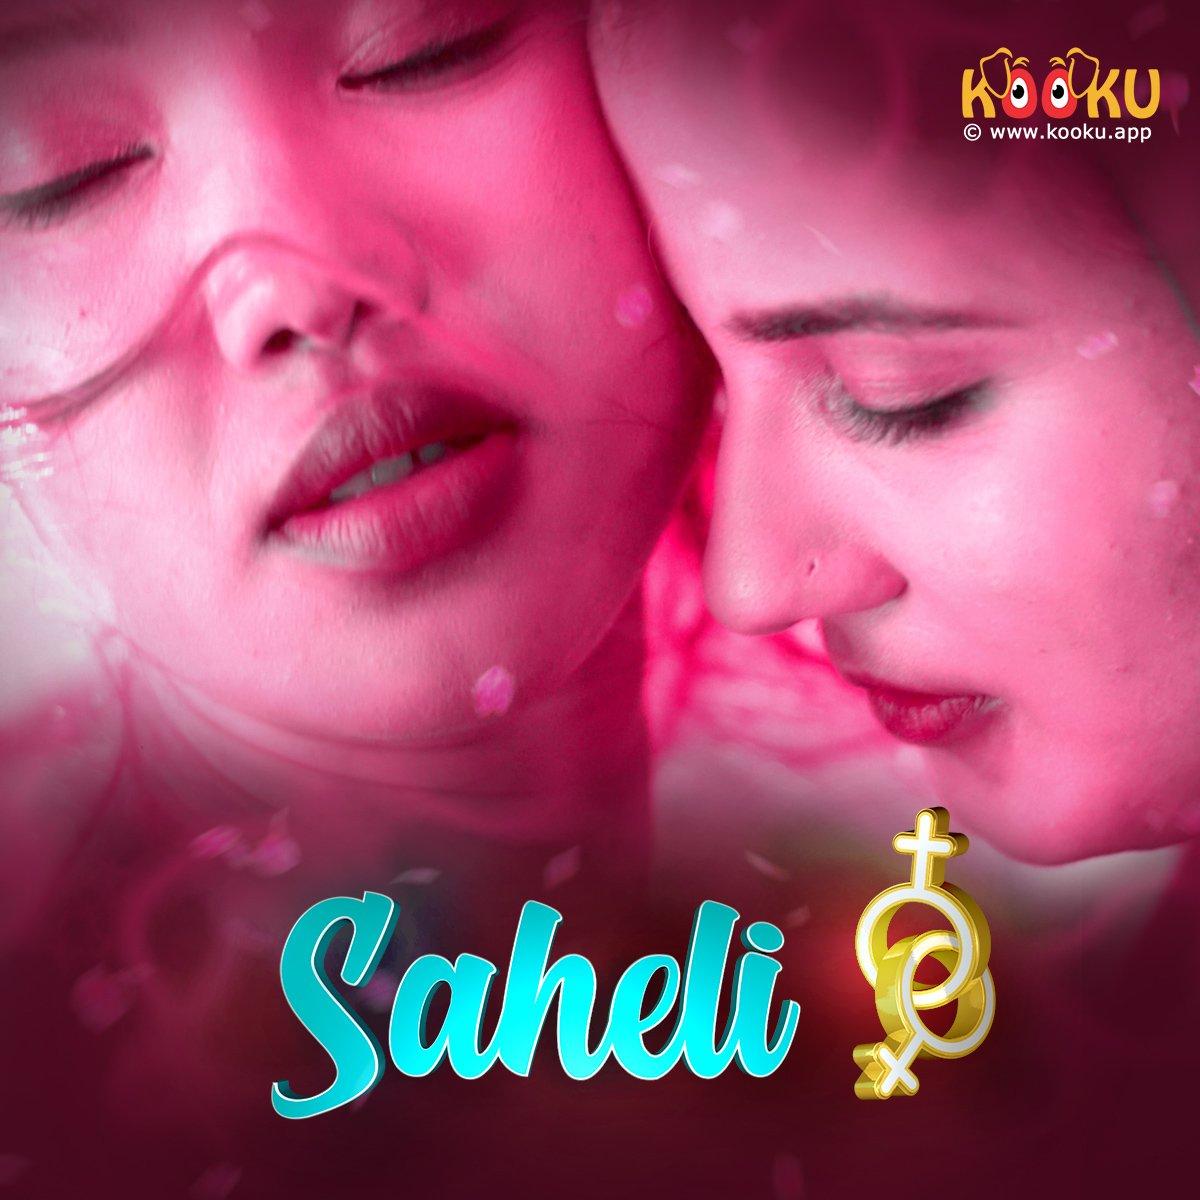 aheli 2020 S01 Hindi Kooku App Web Series Official Trailer 720p HDRip Download